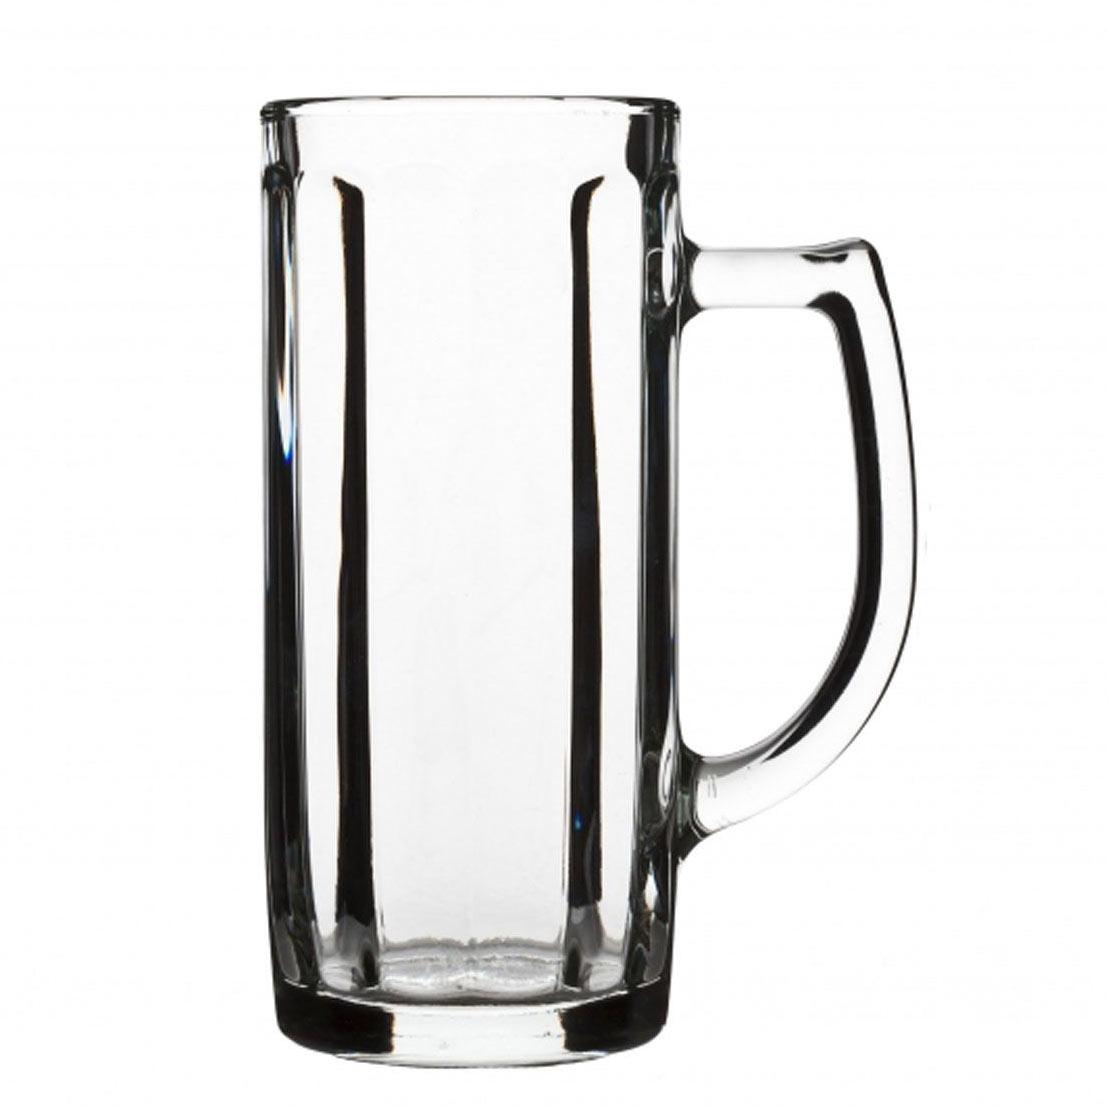 Набор кружек для пива HAMBURG 500мл, 2шт